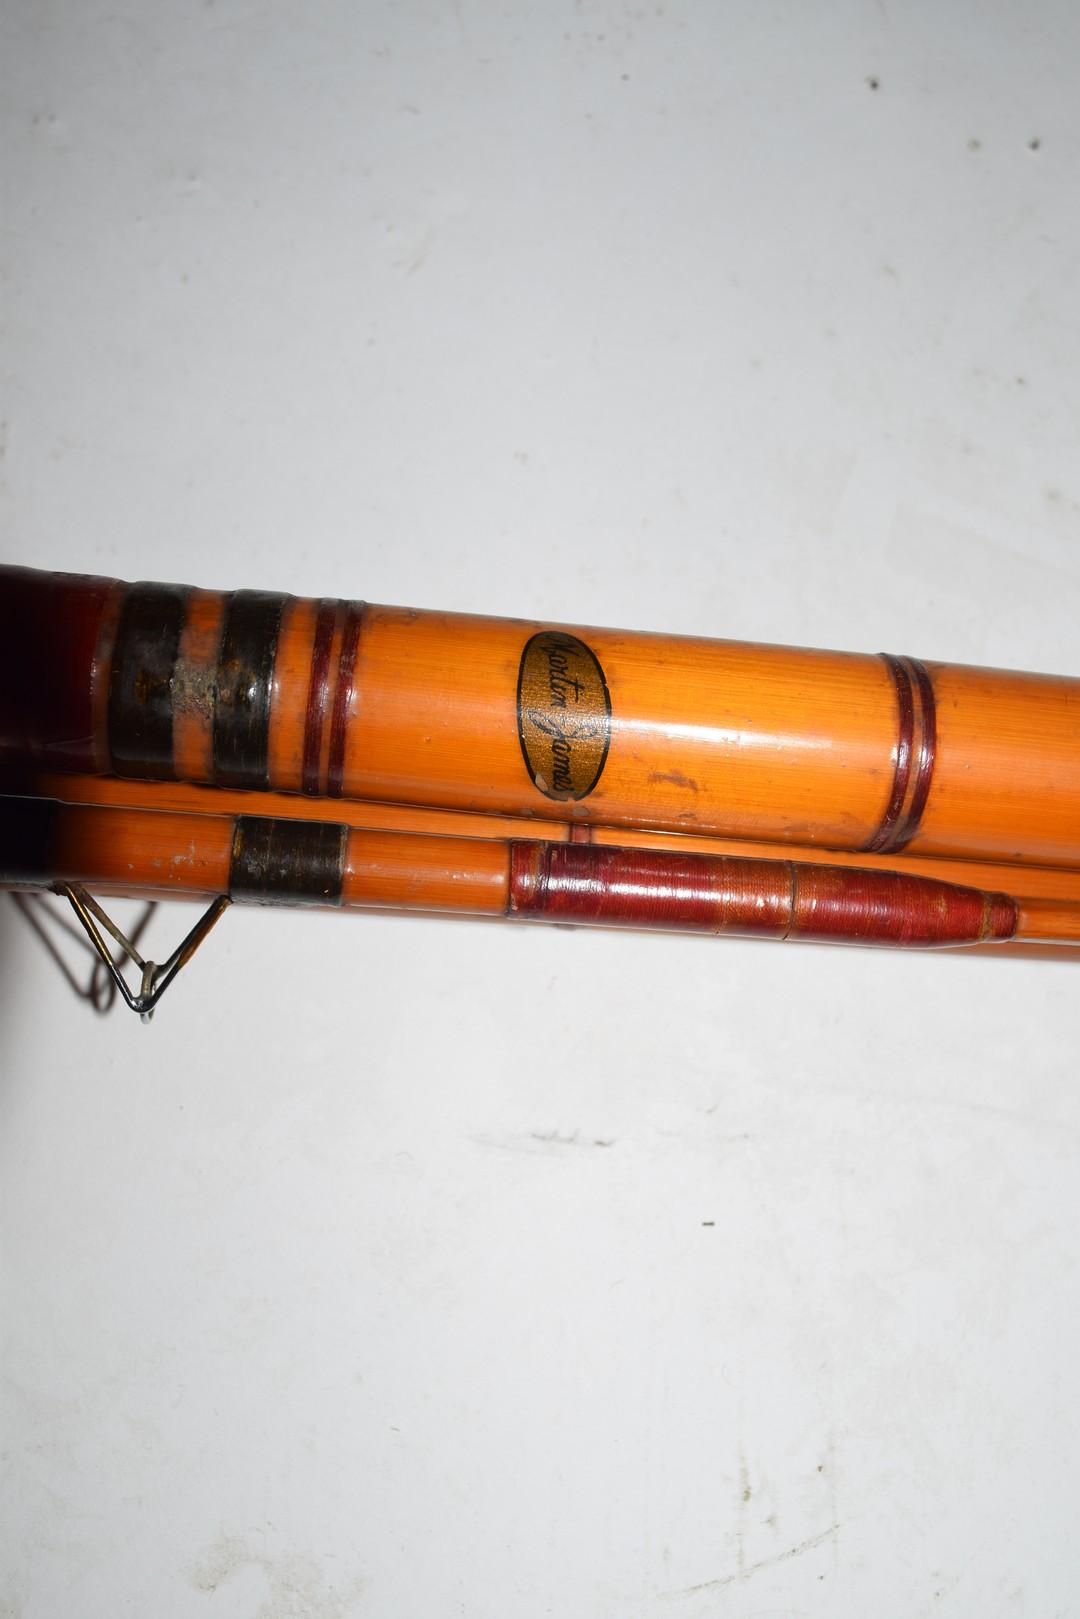 Vintage three-piece cane fishing rod - Image 2 of 4